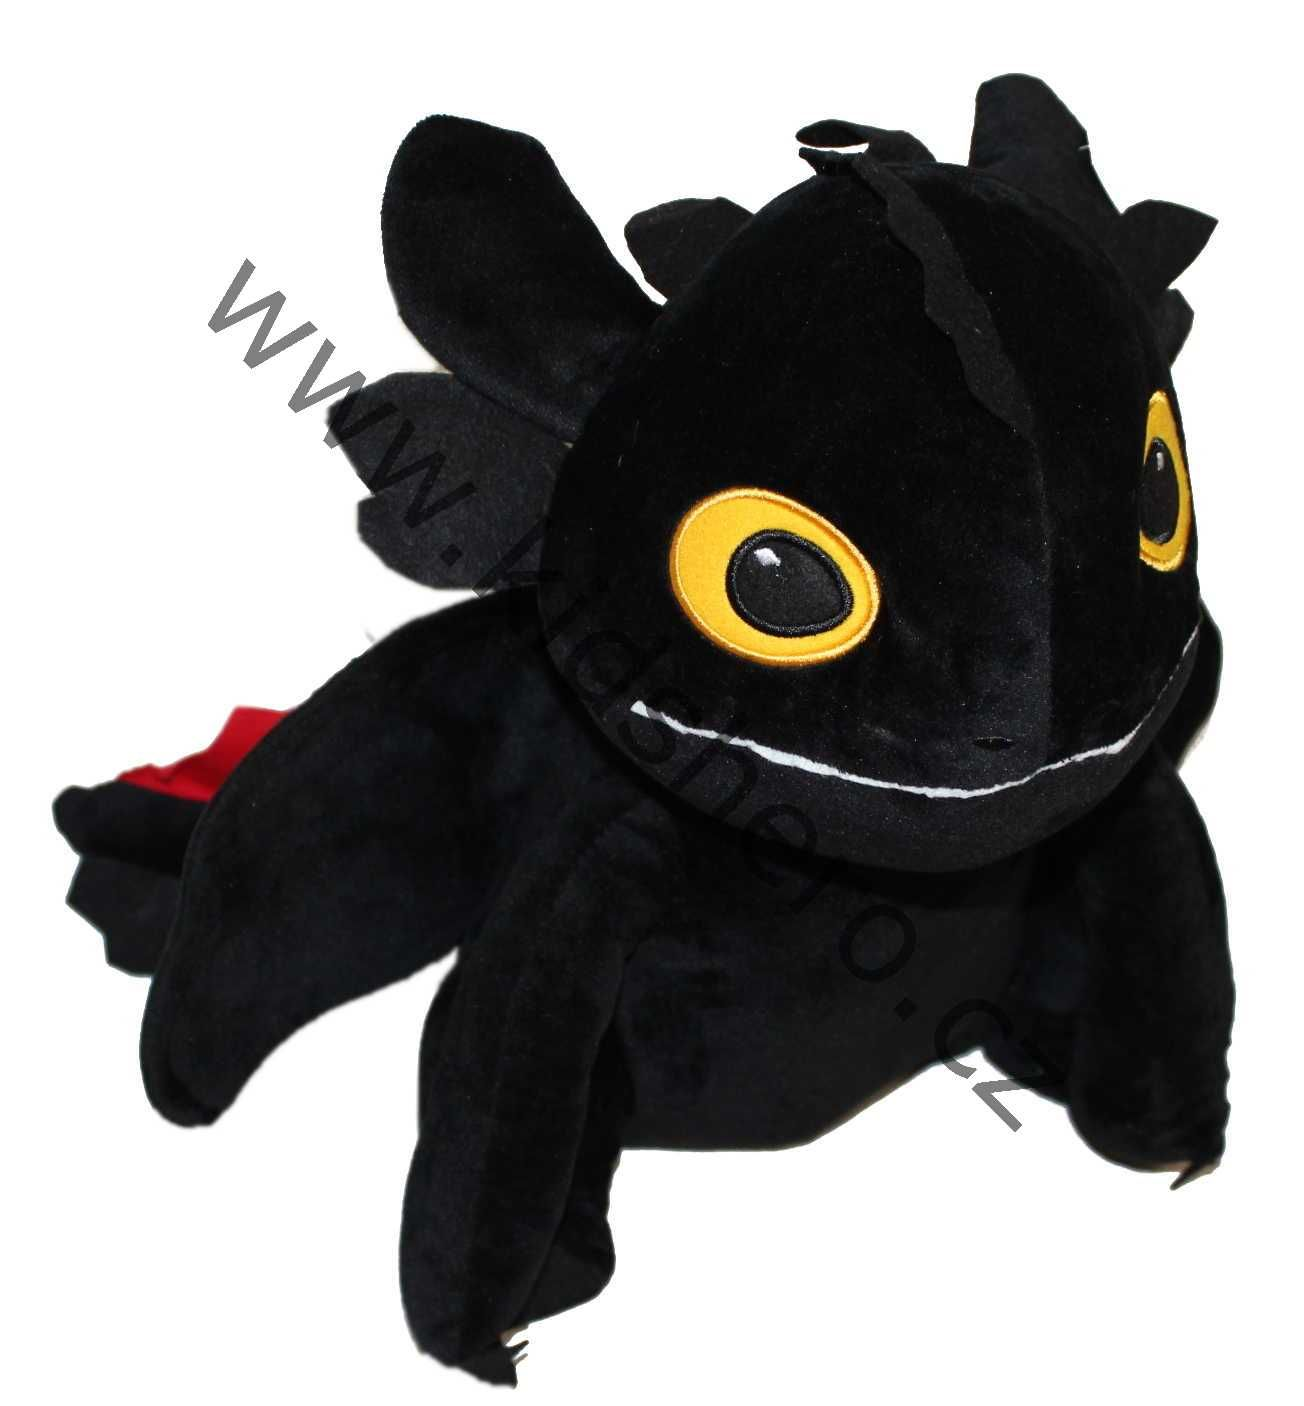 Plyšová hračka Bezzubka, Dragon Jak vycvičit draka